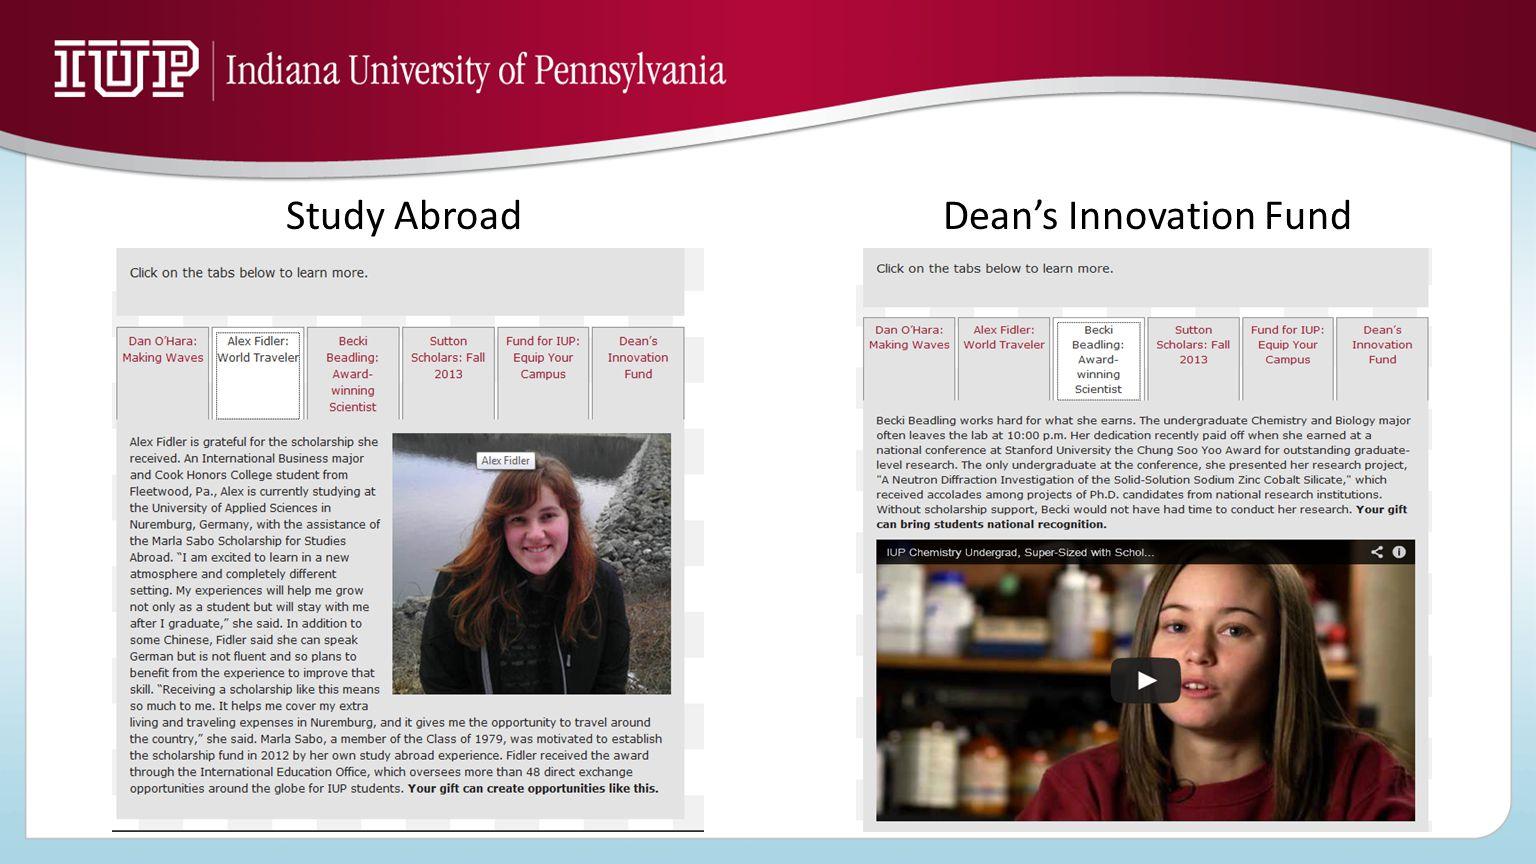 Study AbroadDean's Innovation Fund